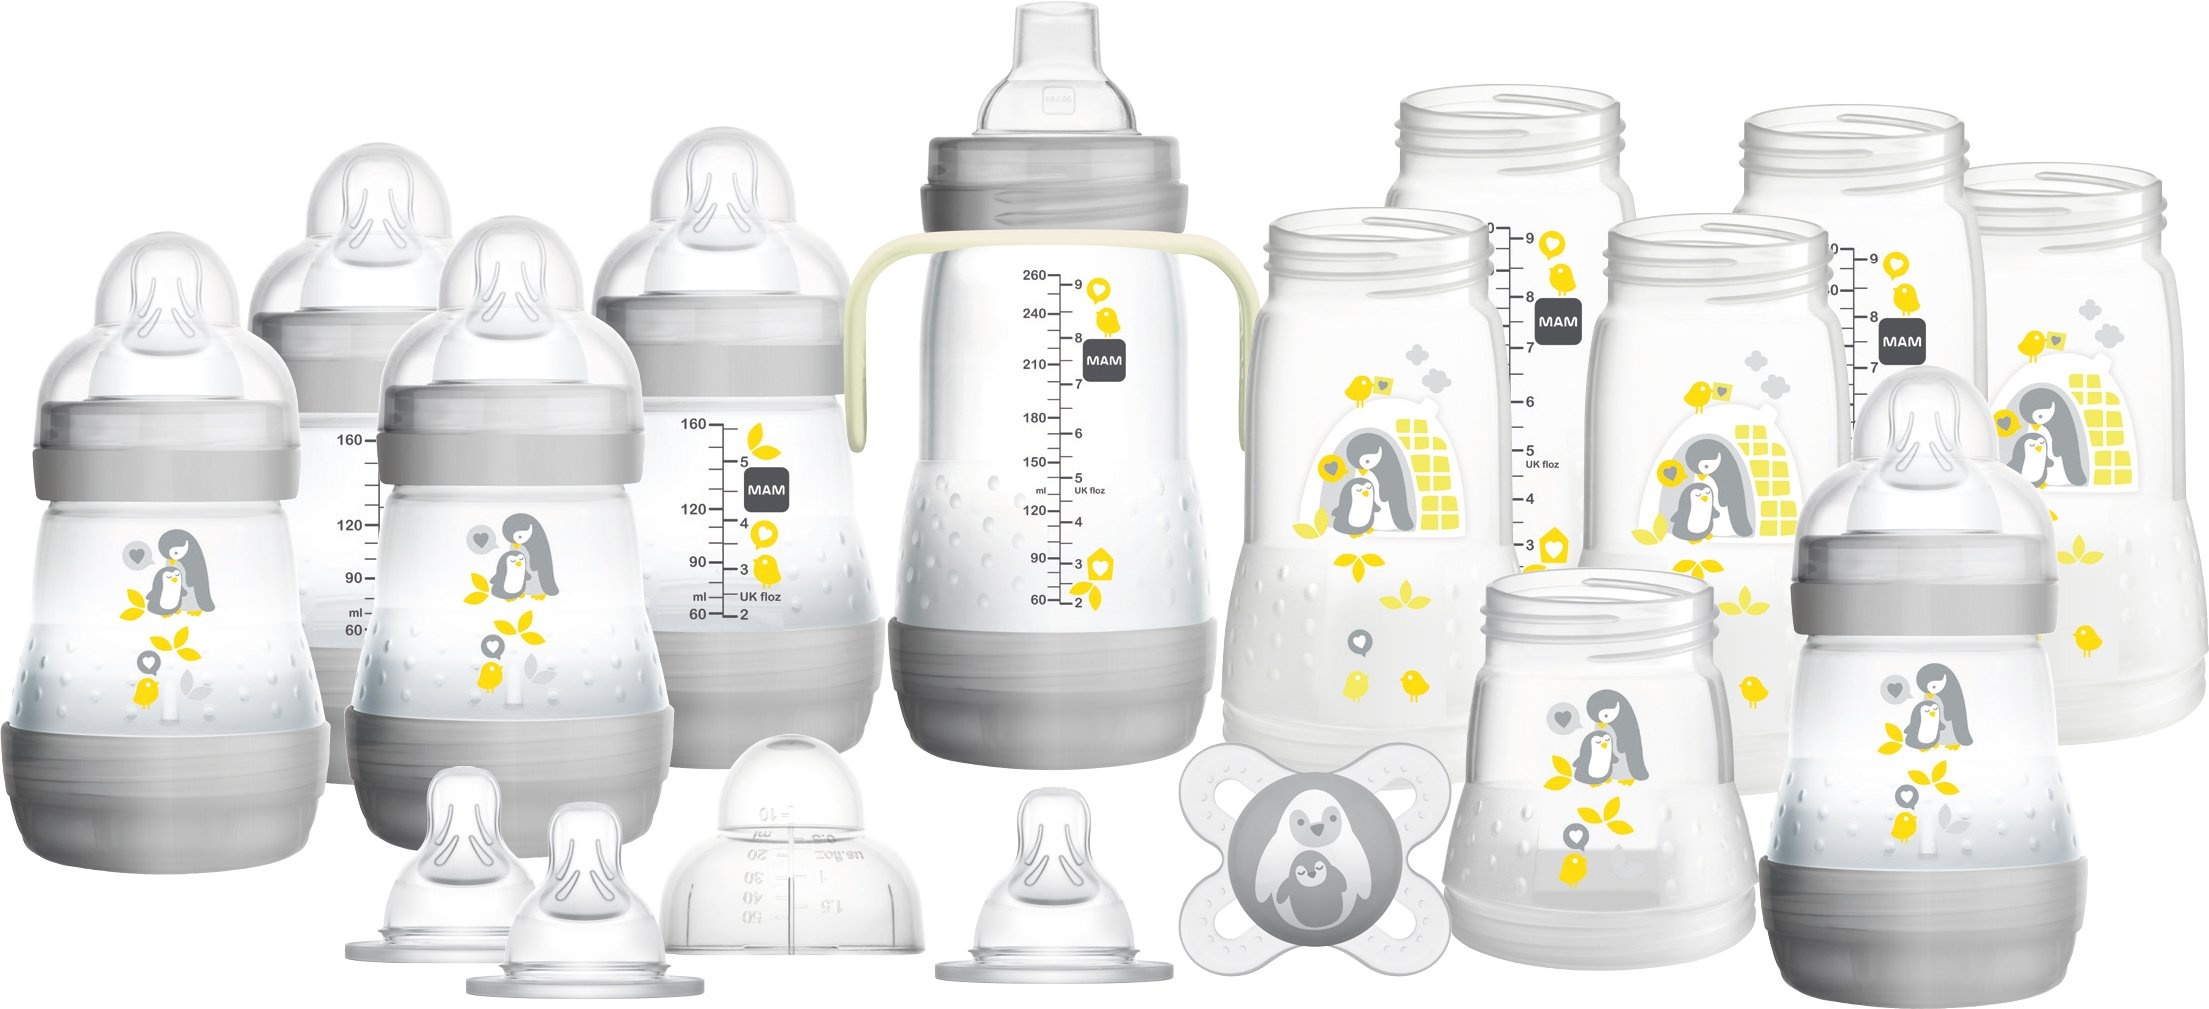 MAM Easy Start Self Sterilising Anti-Colic Bottle Starter Set - Large 17 Pieces Set